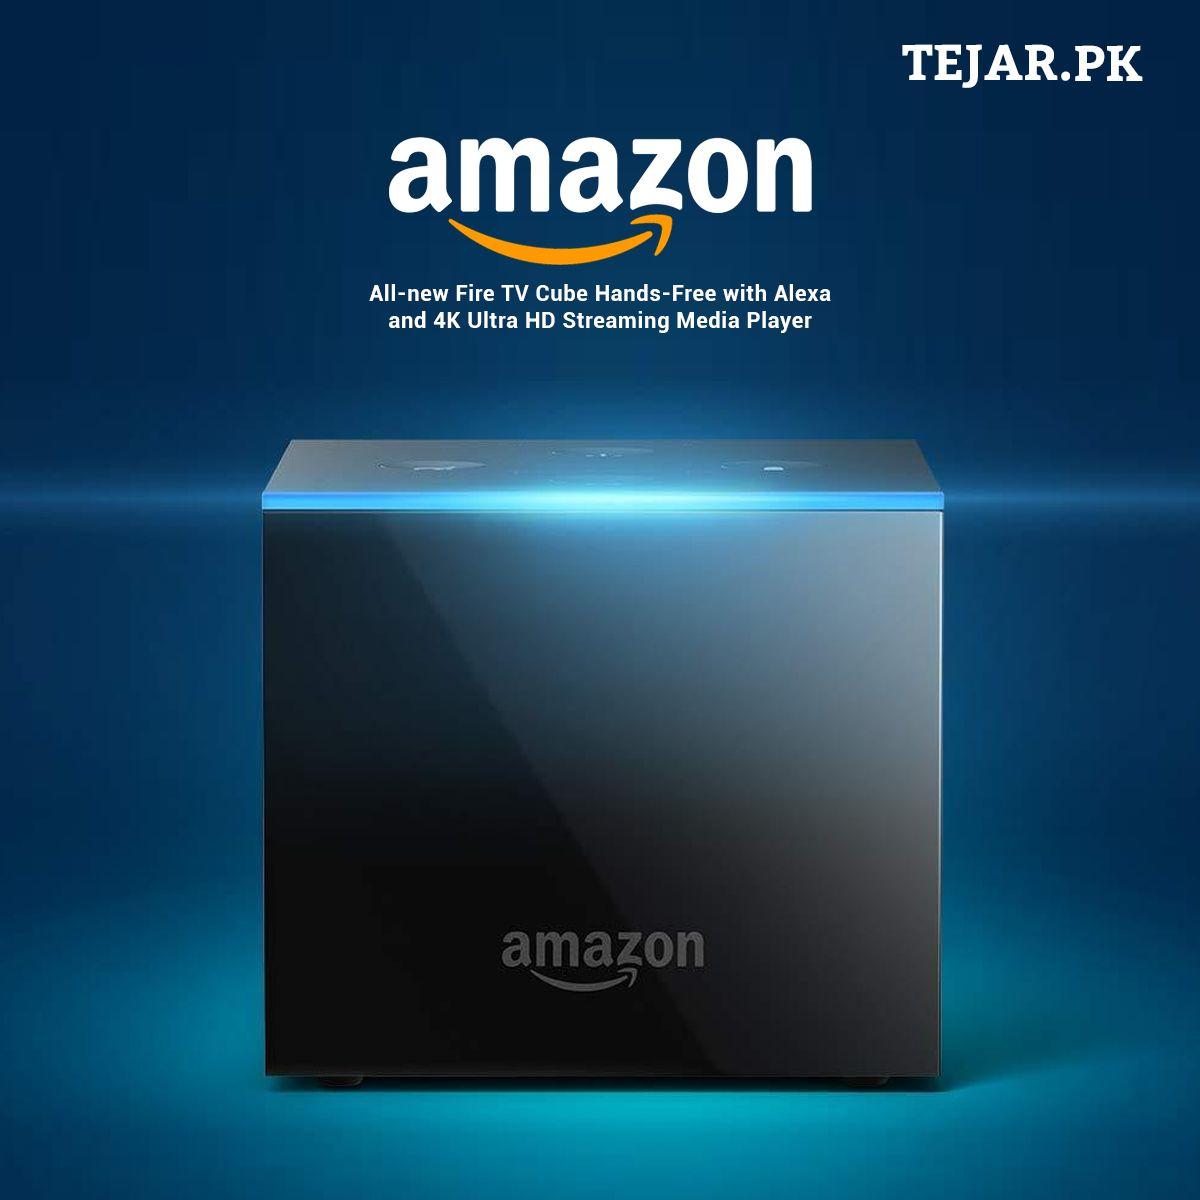 Amazon allnew fire tv cube handsfree with alexa and 4k